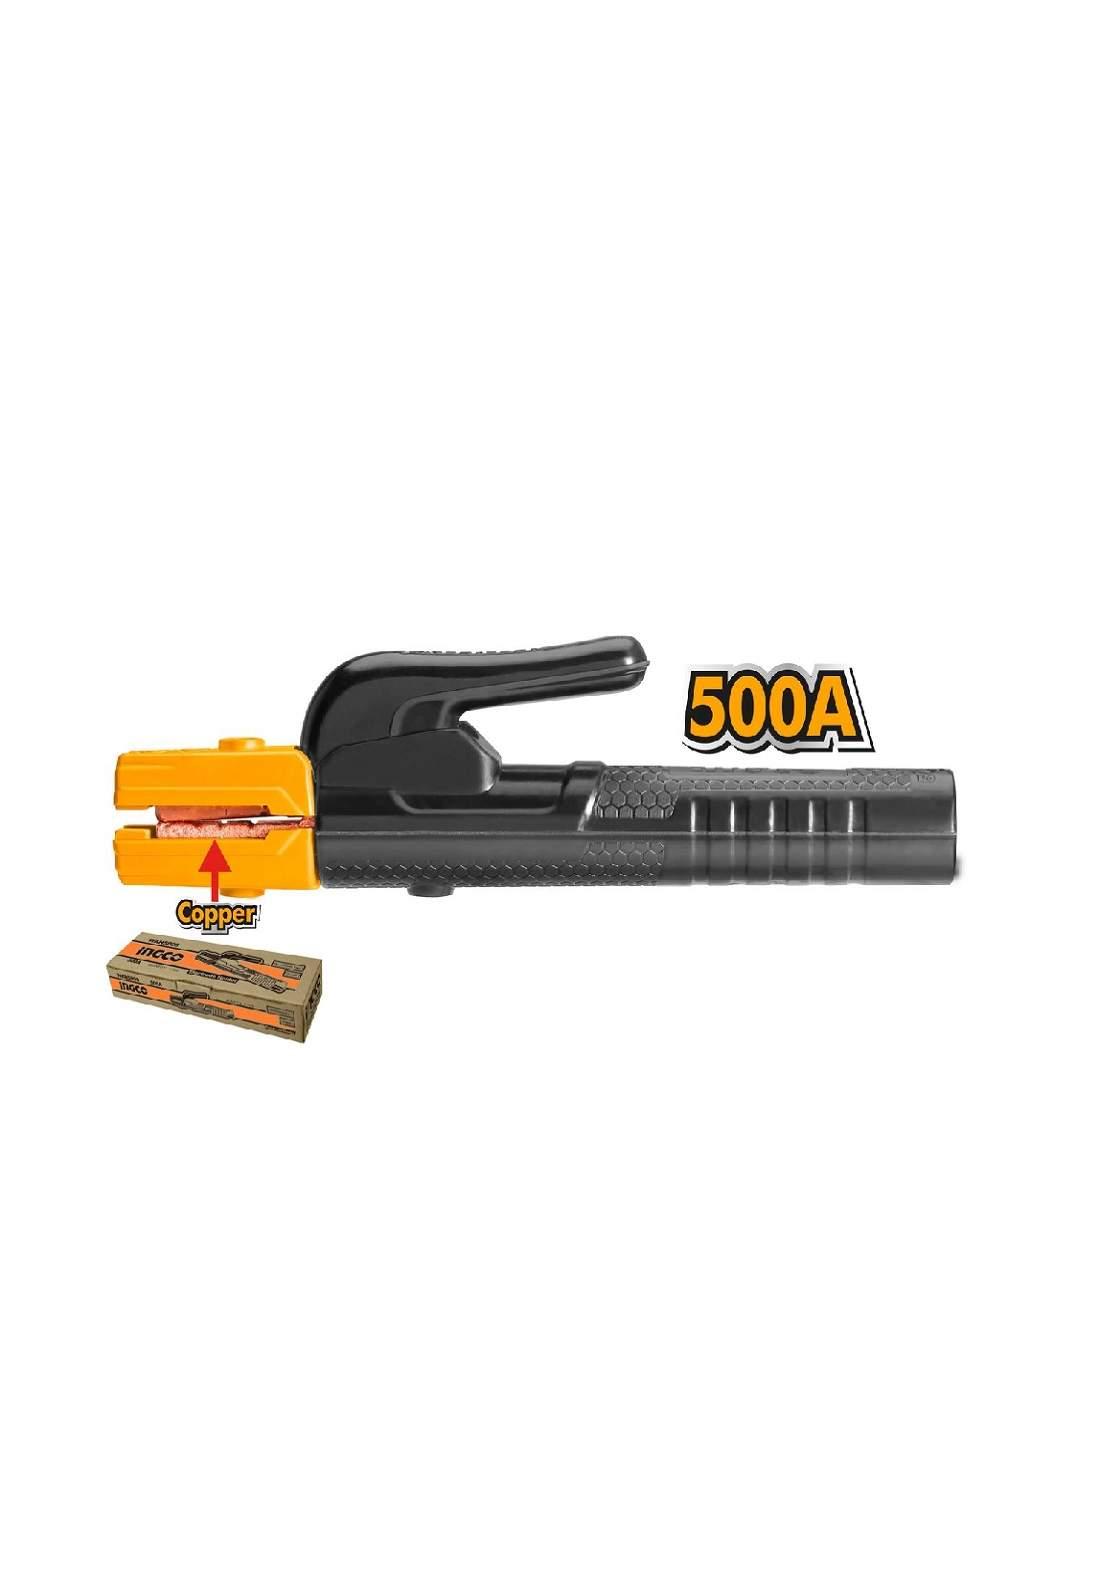 INGCO WAH5008 Electrode Holder (500A) يدة لحام